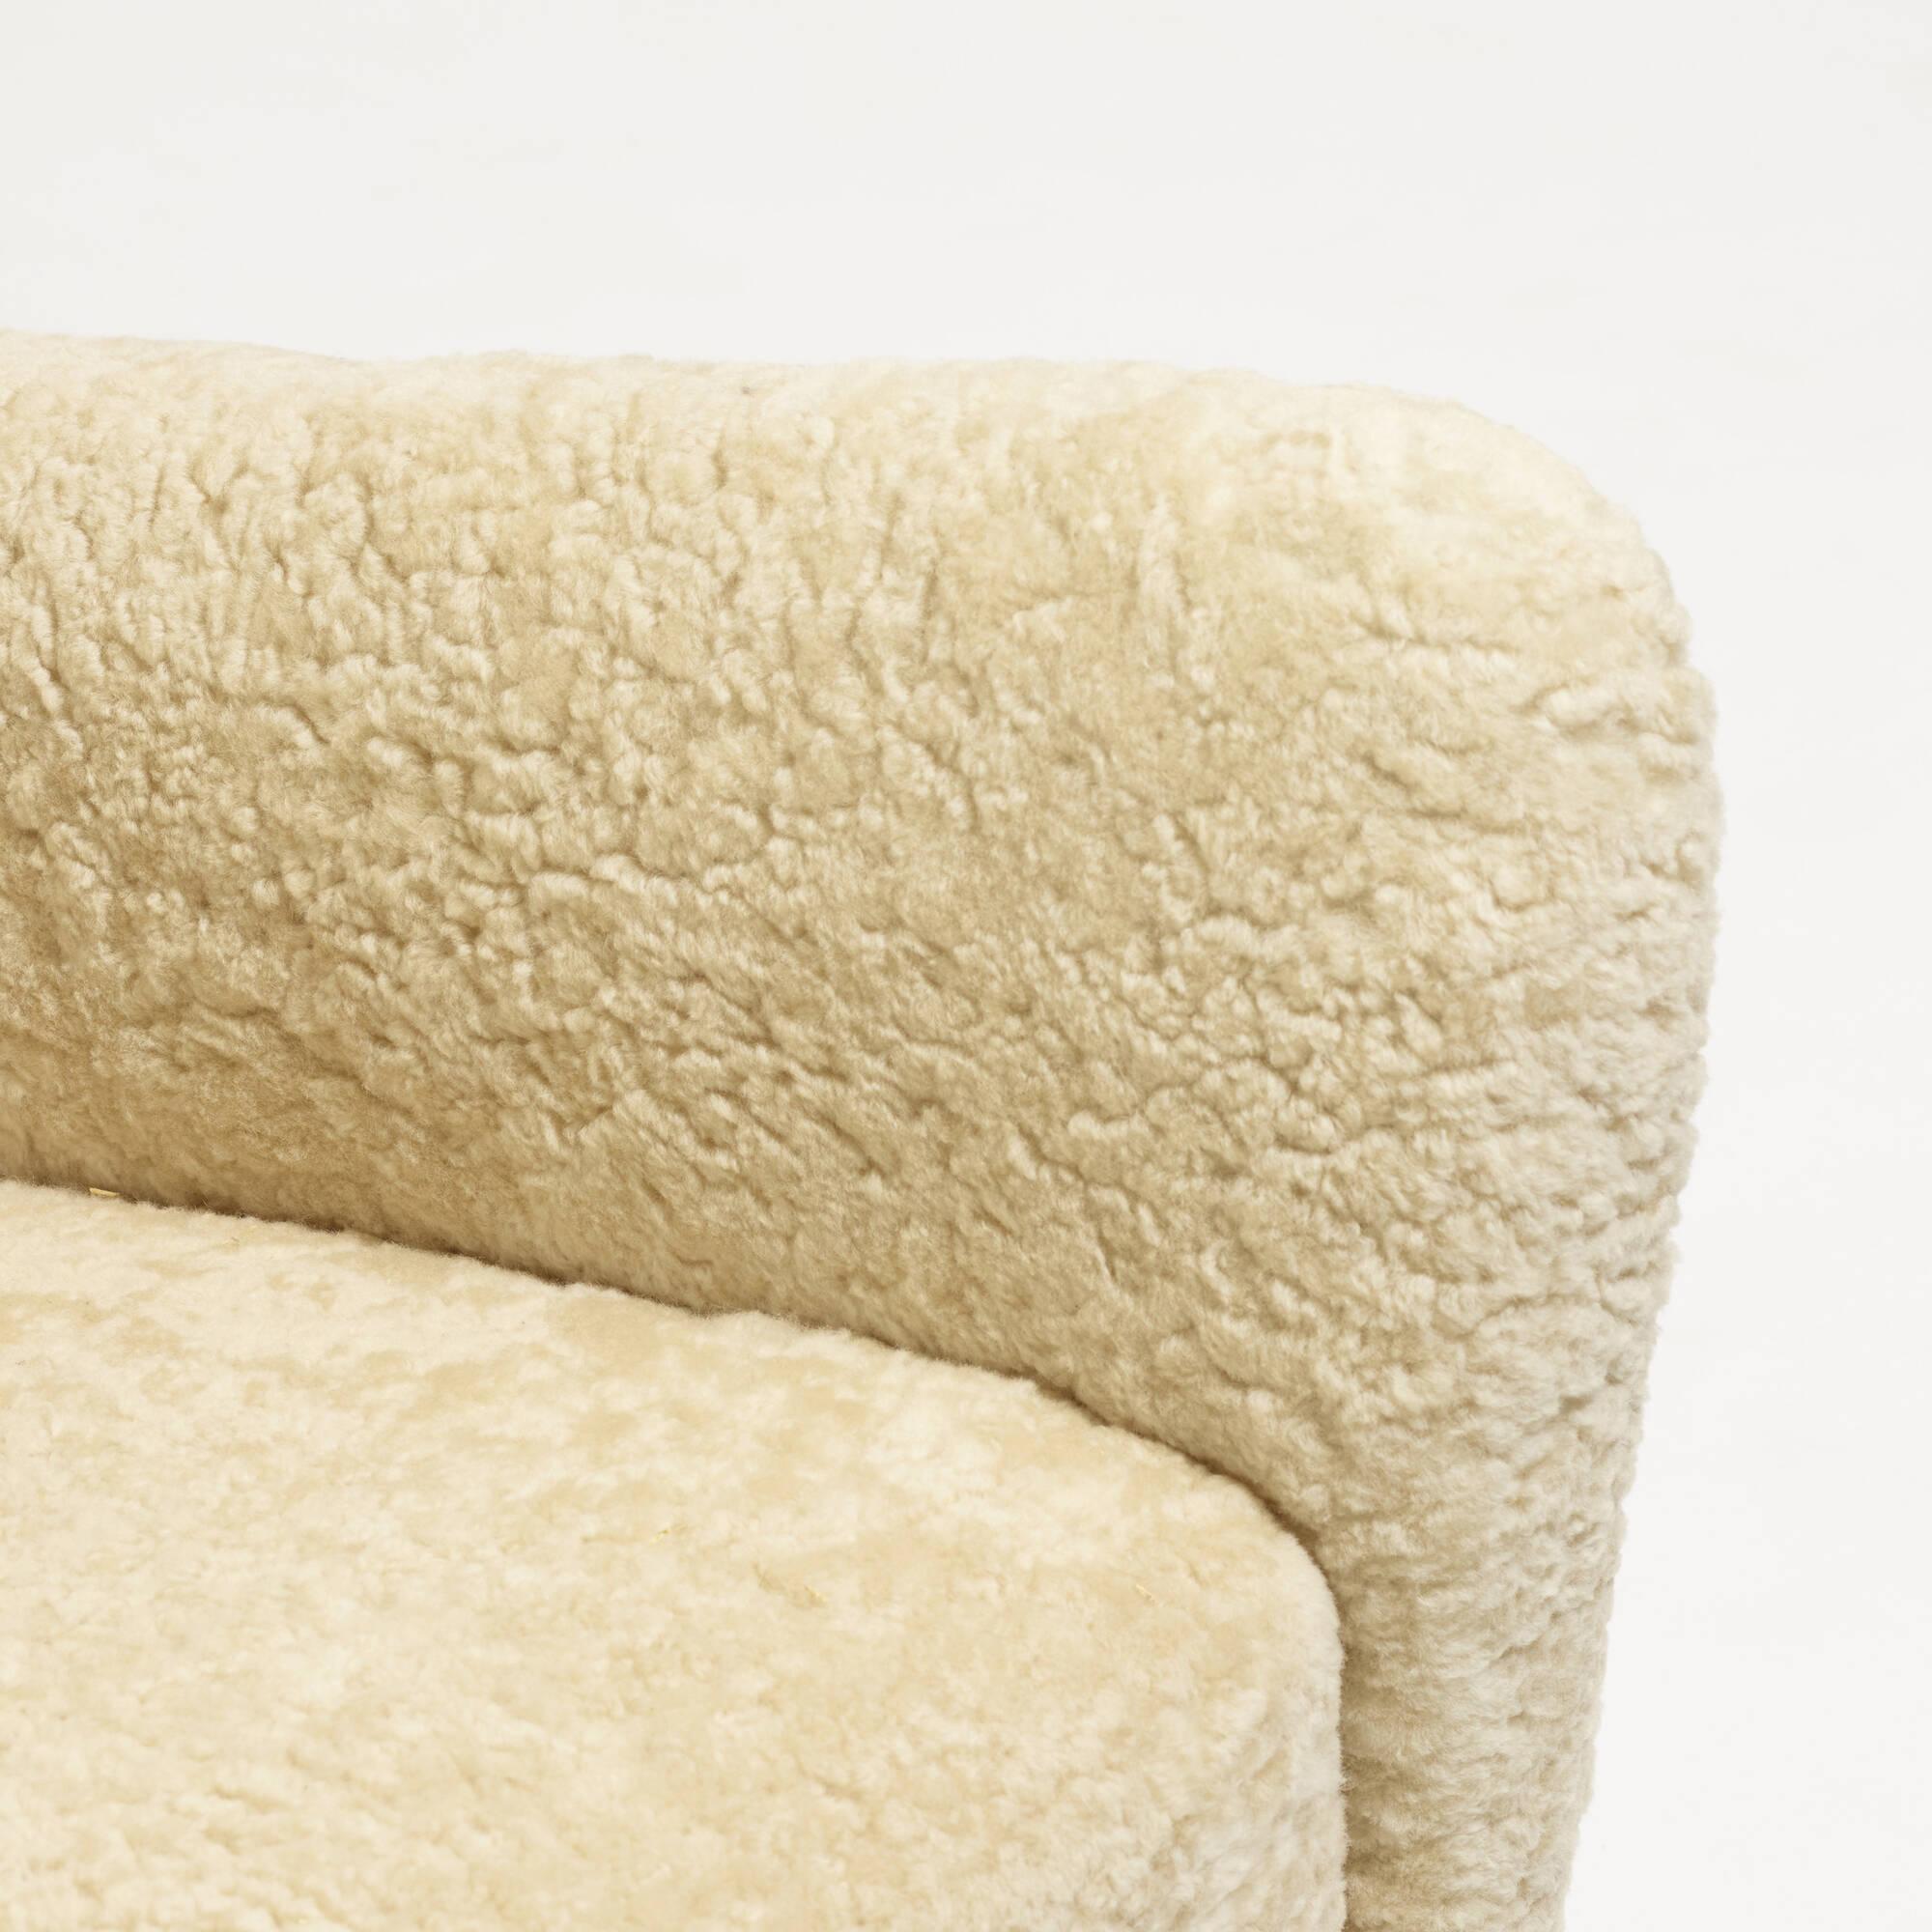 338: Fritz Hansen / Wing Back armchair, model 1672 (4 of 5)